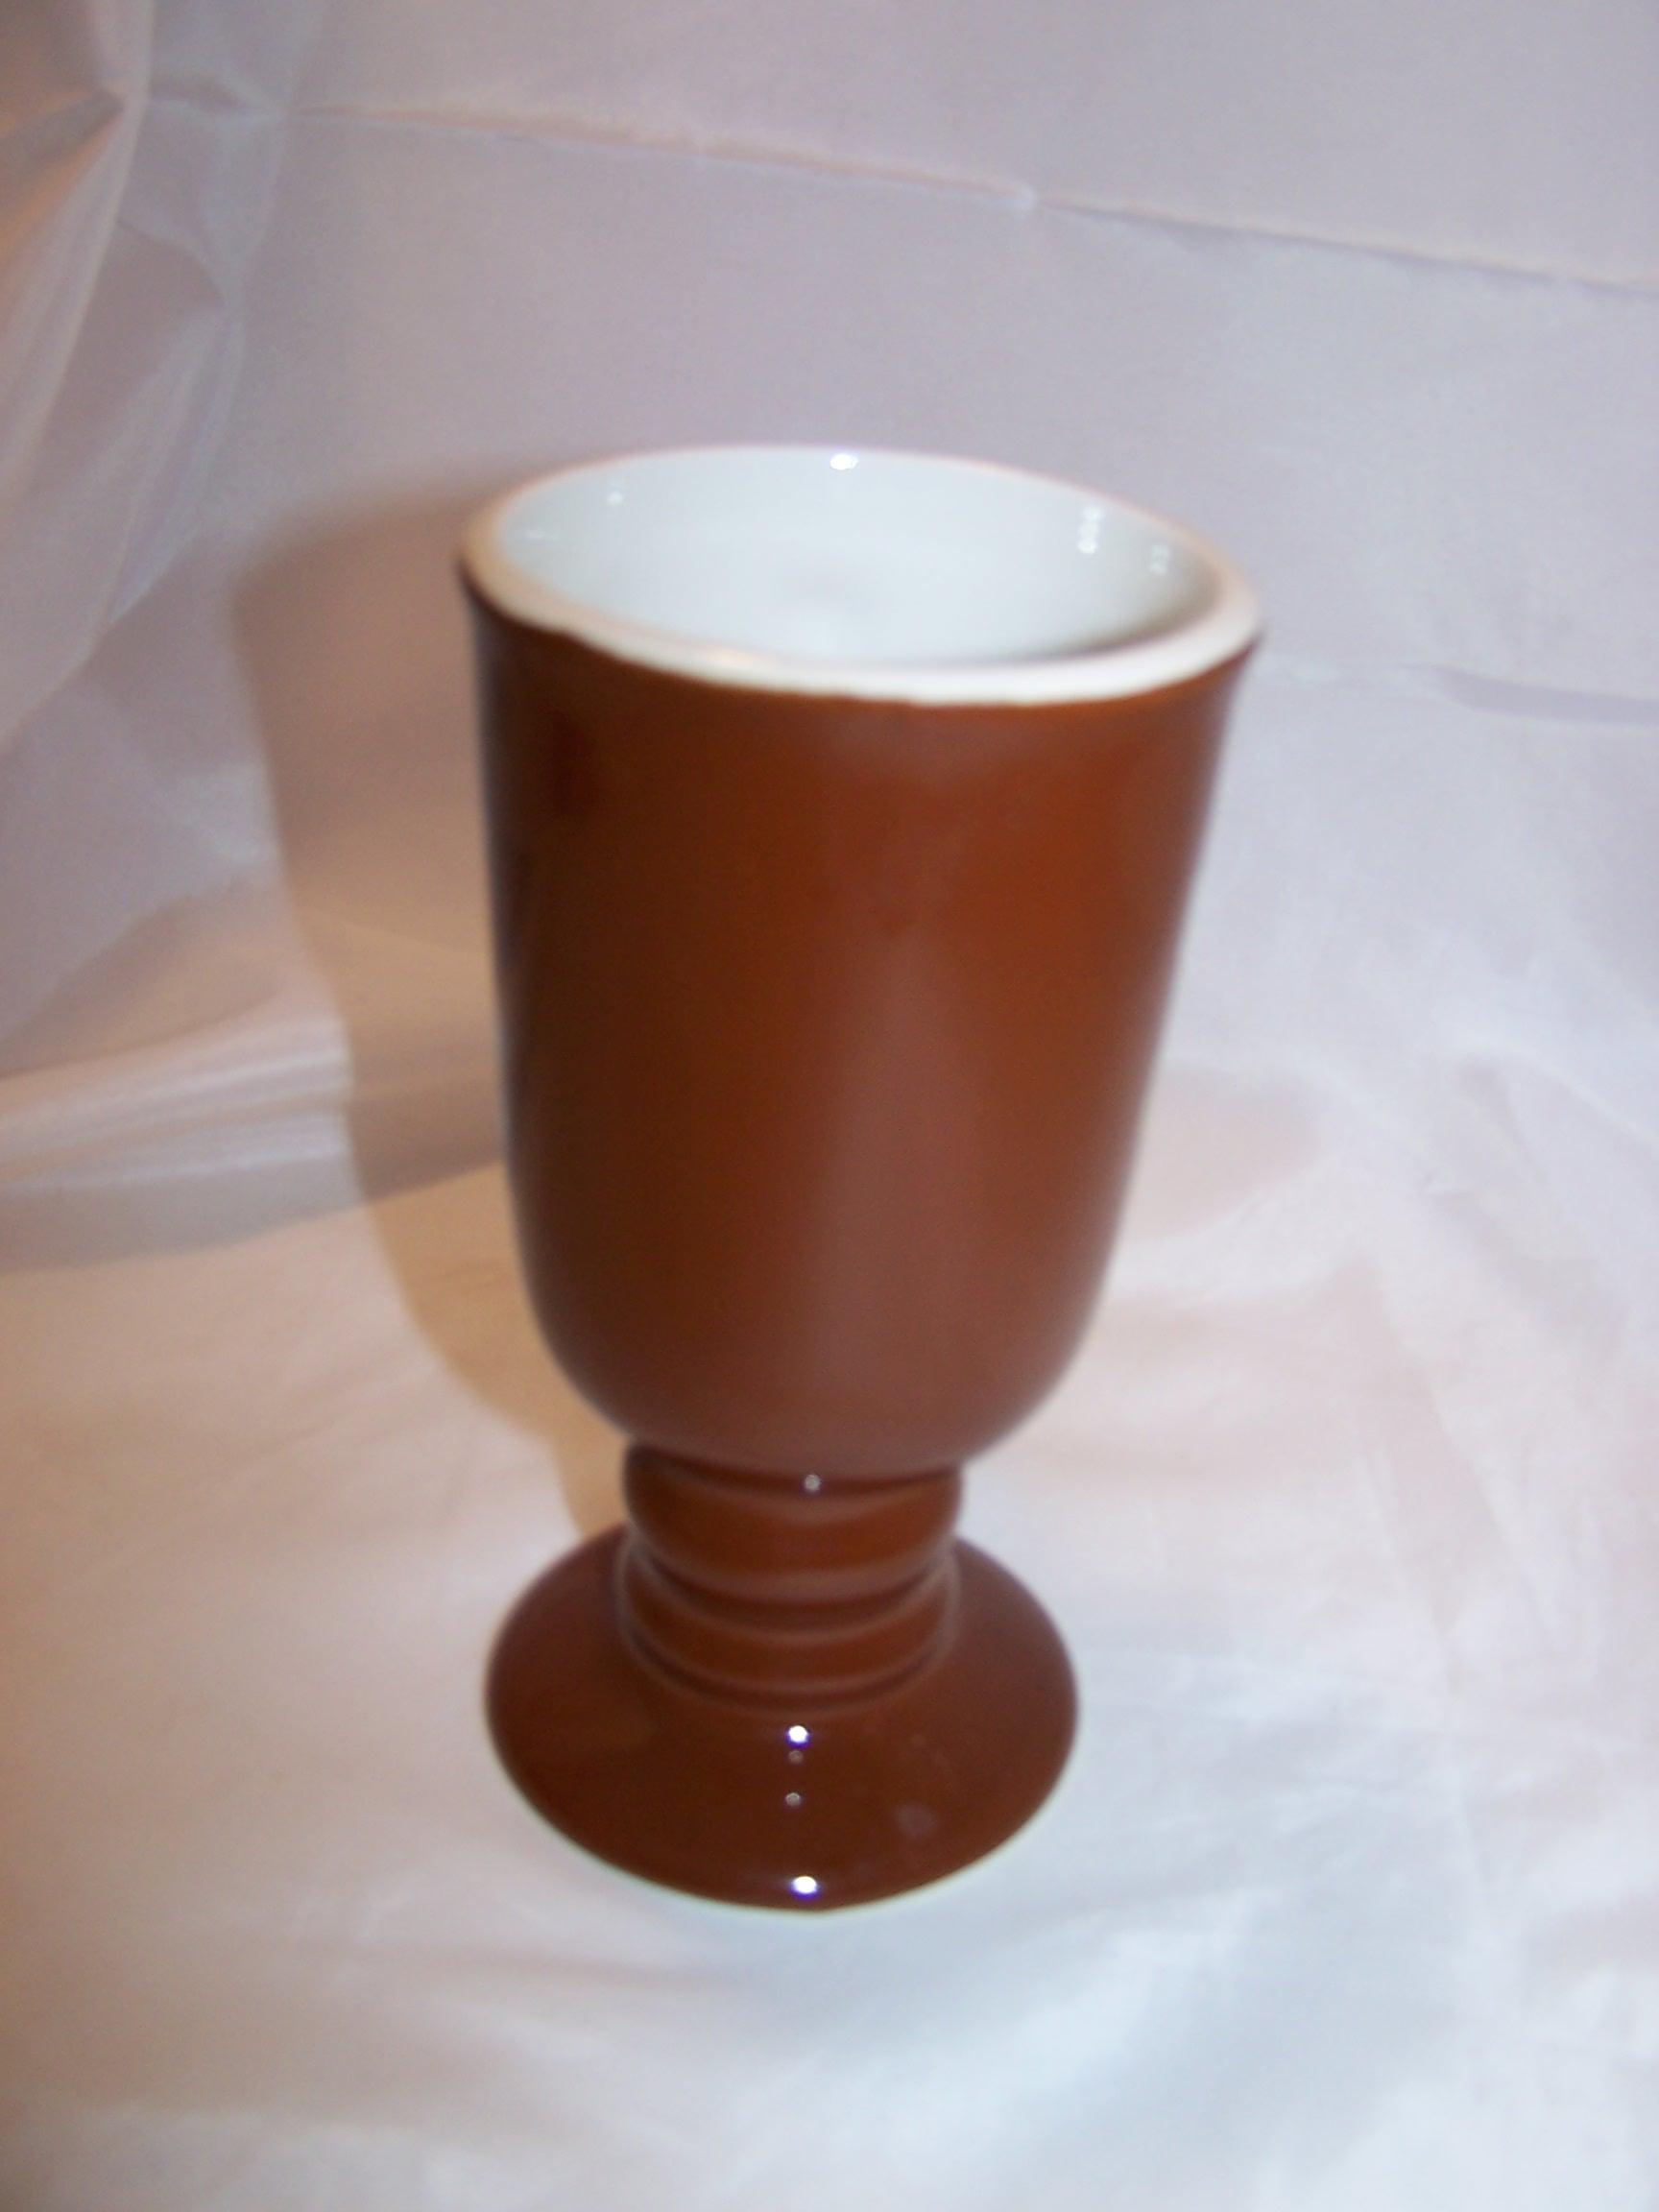 Image 3 of George Steinbrenner Mug, The Pewter Mug Restaurant